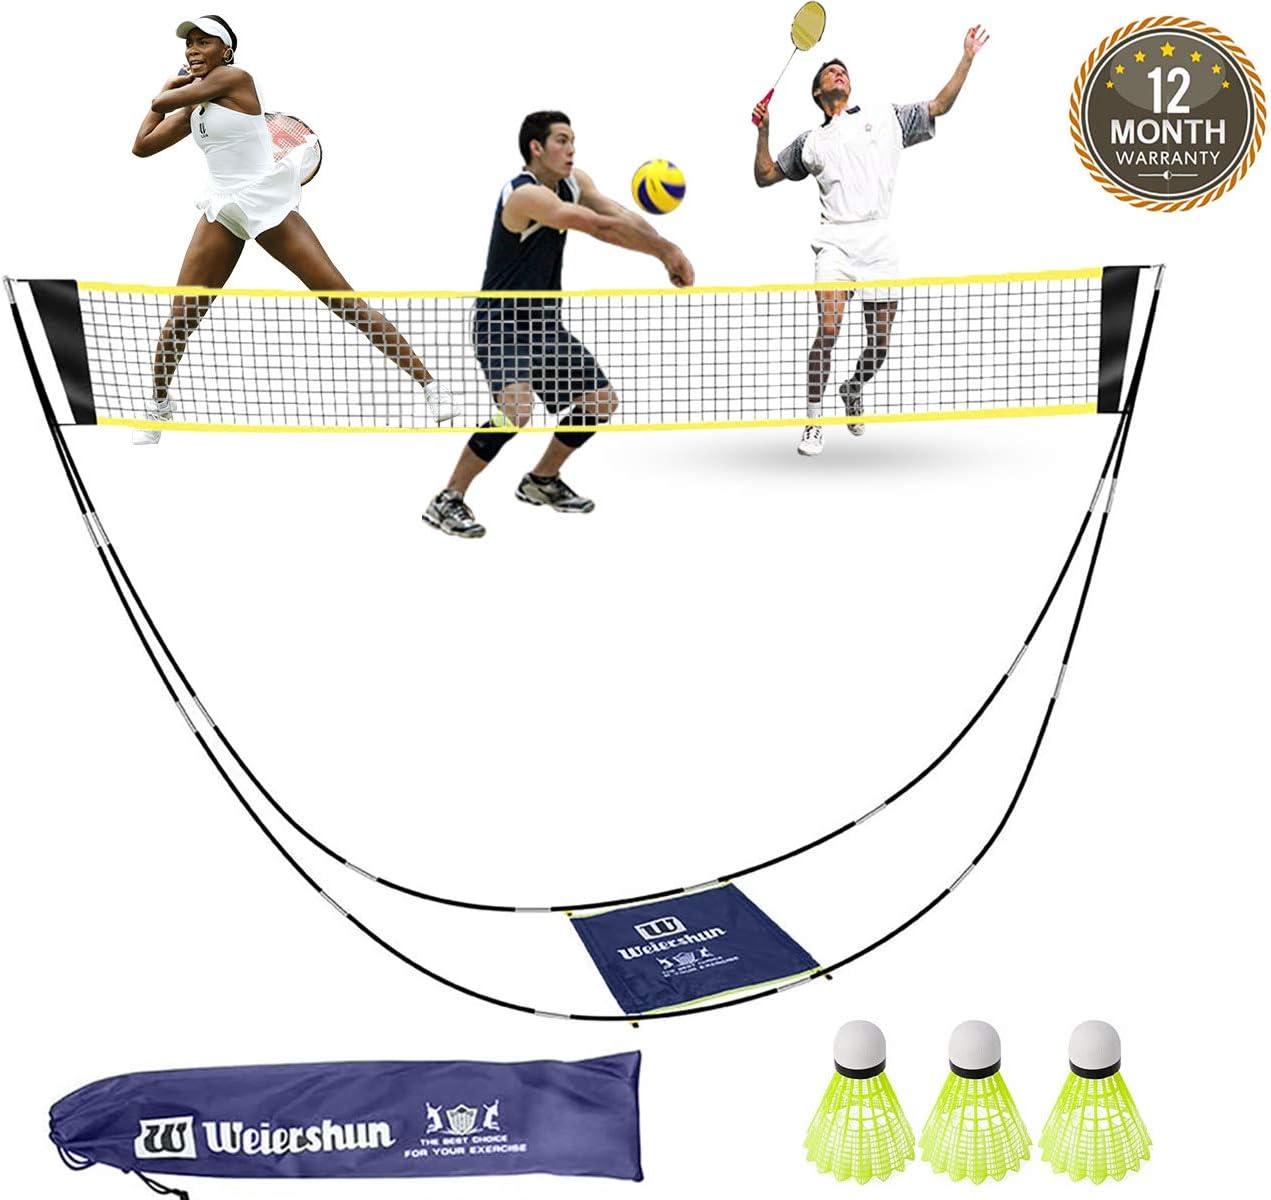 Weiershun Portable Badminton Net